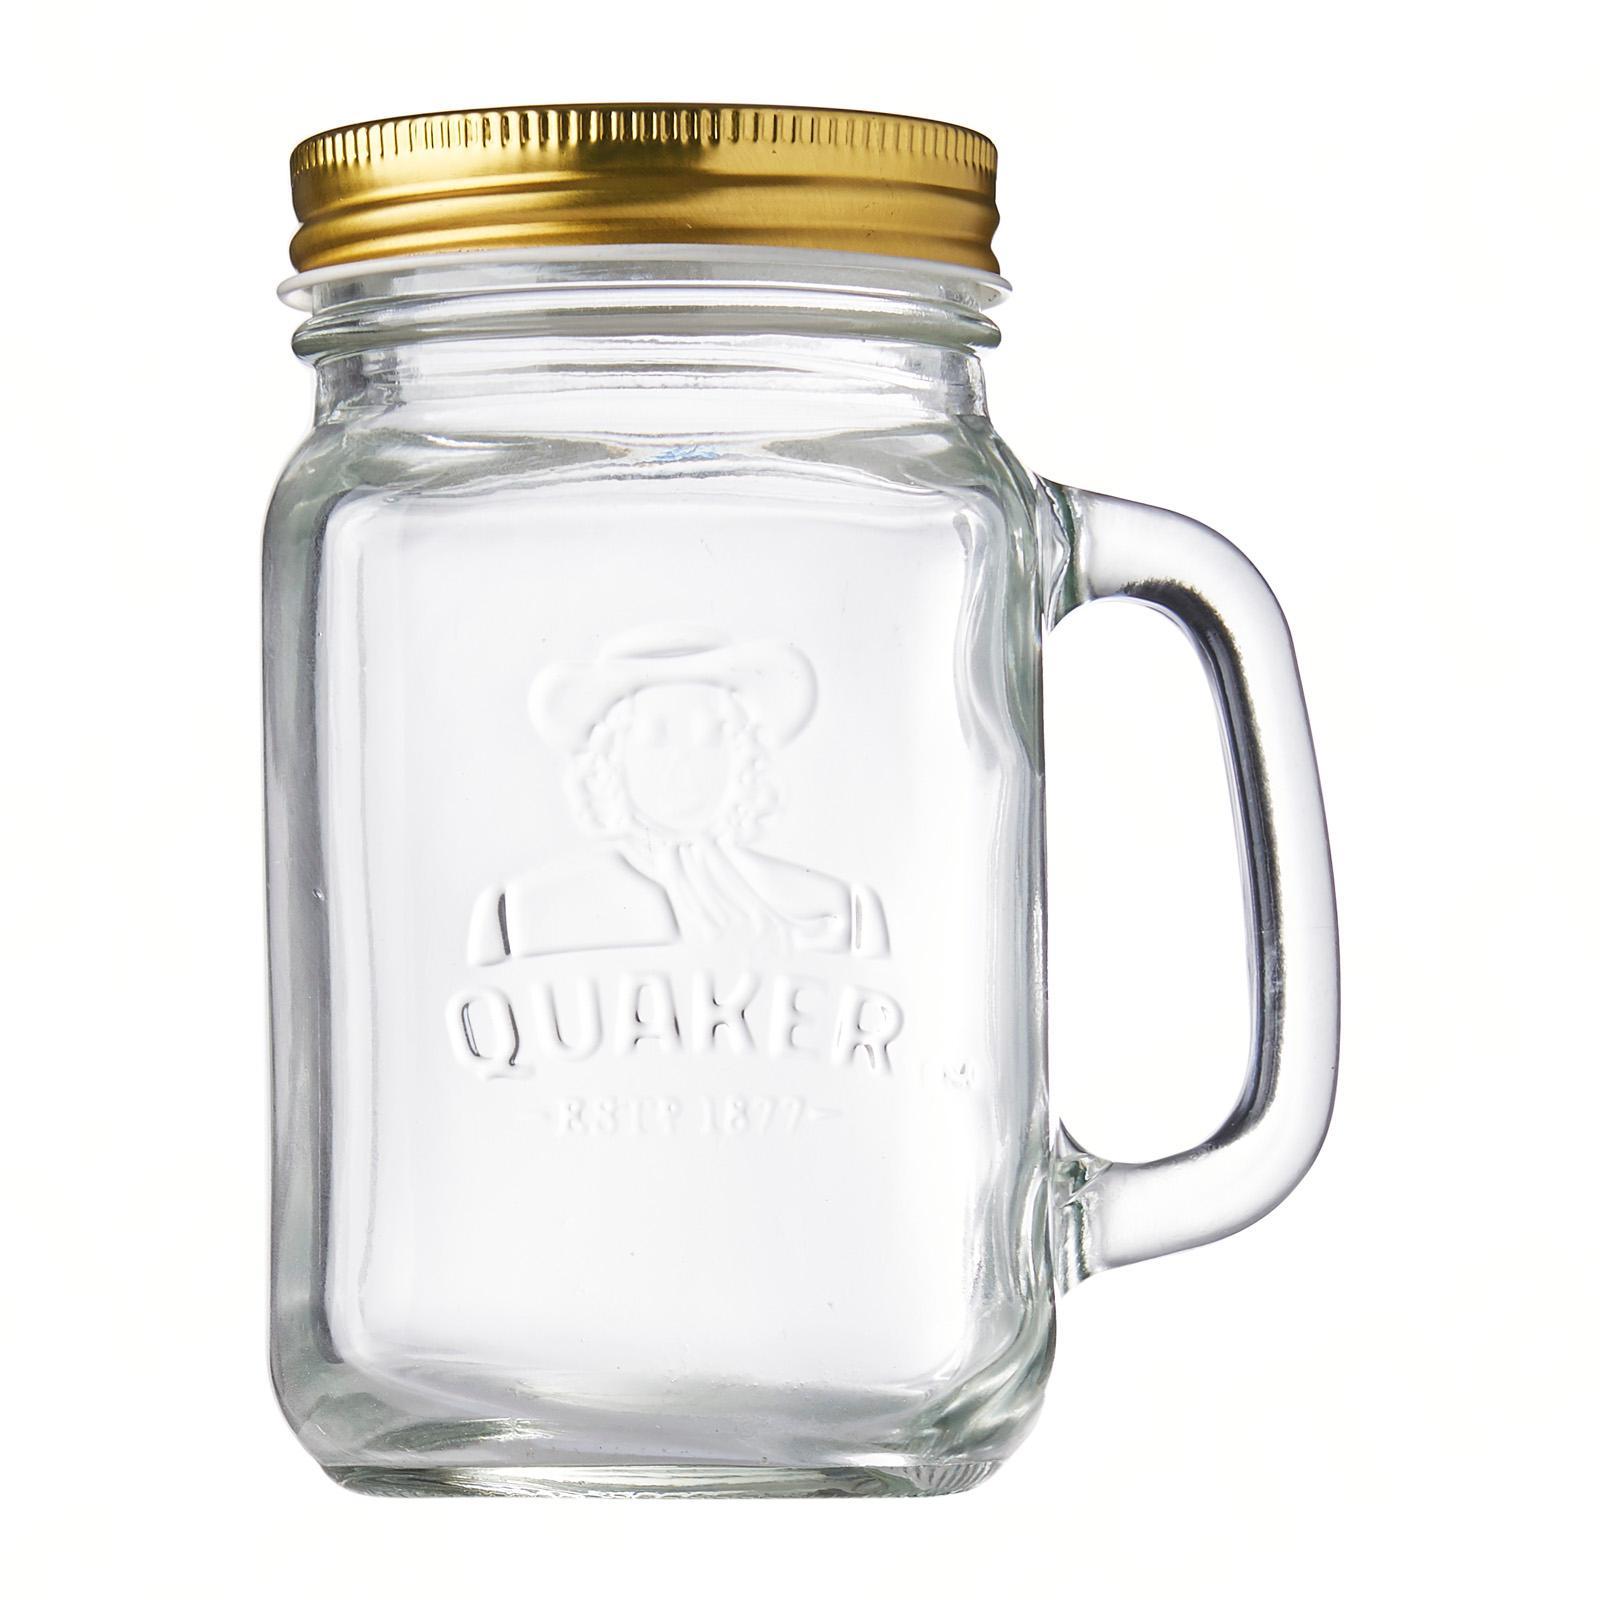 QUAKER Mason Jar (Gift with Purchase)